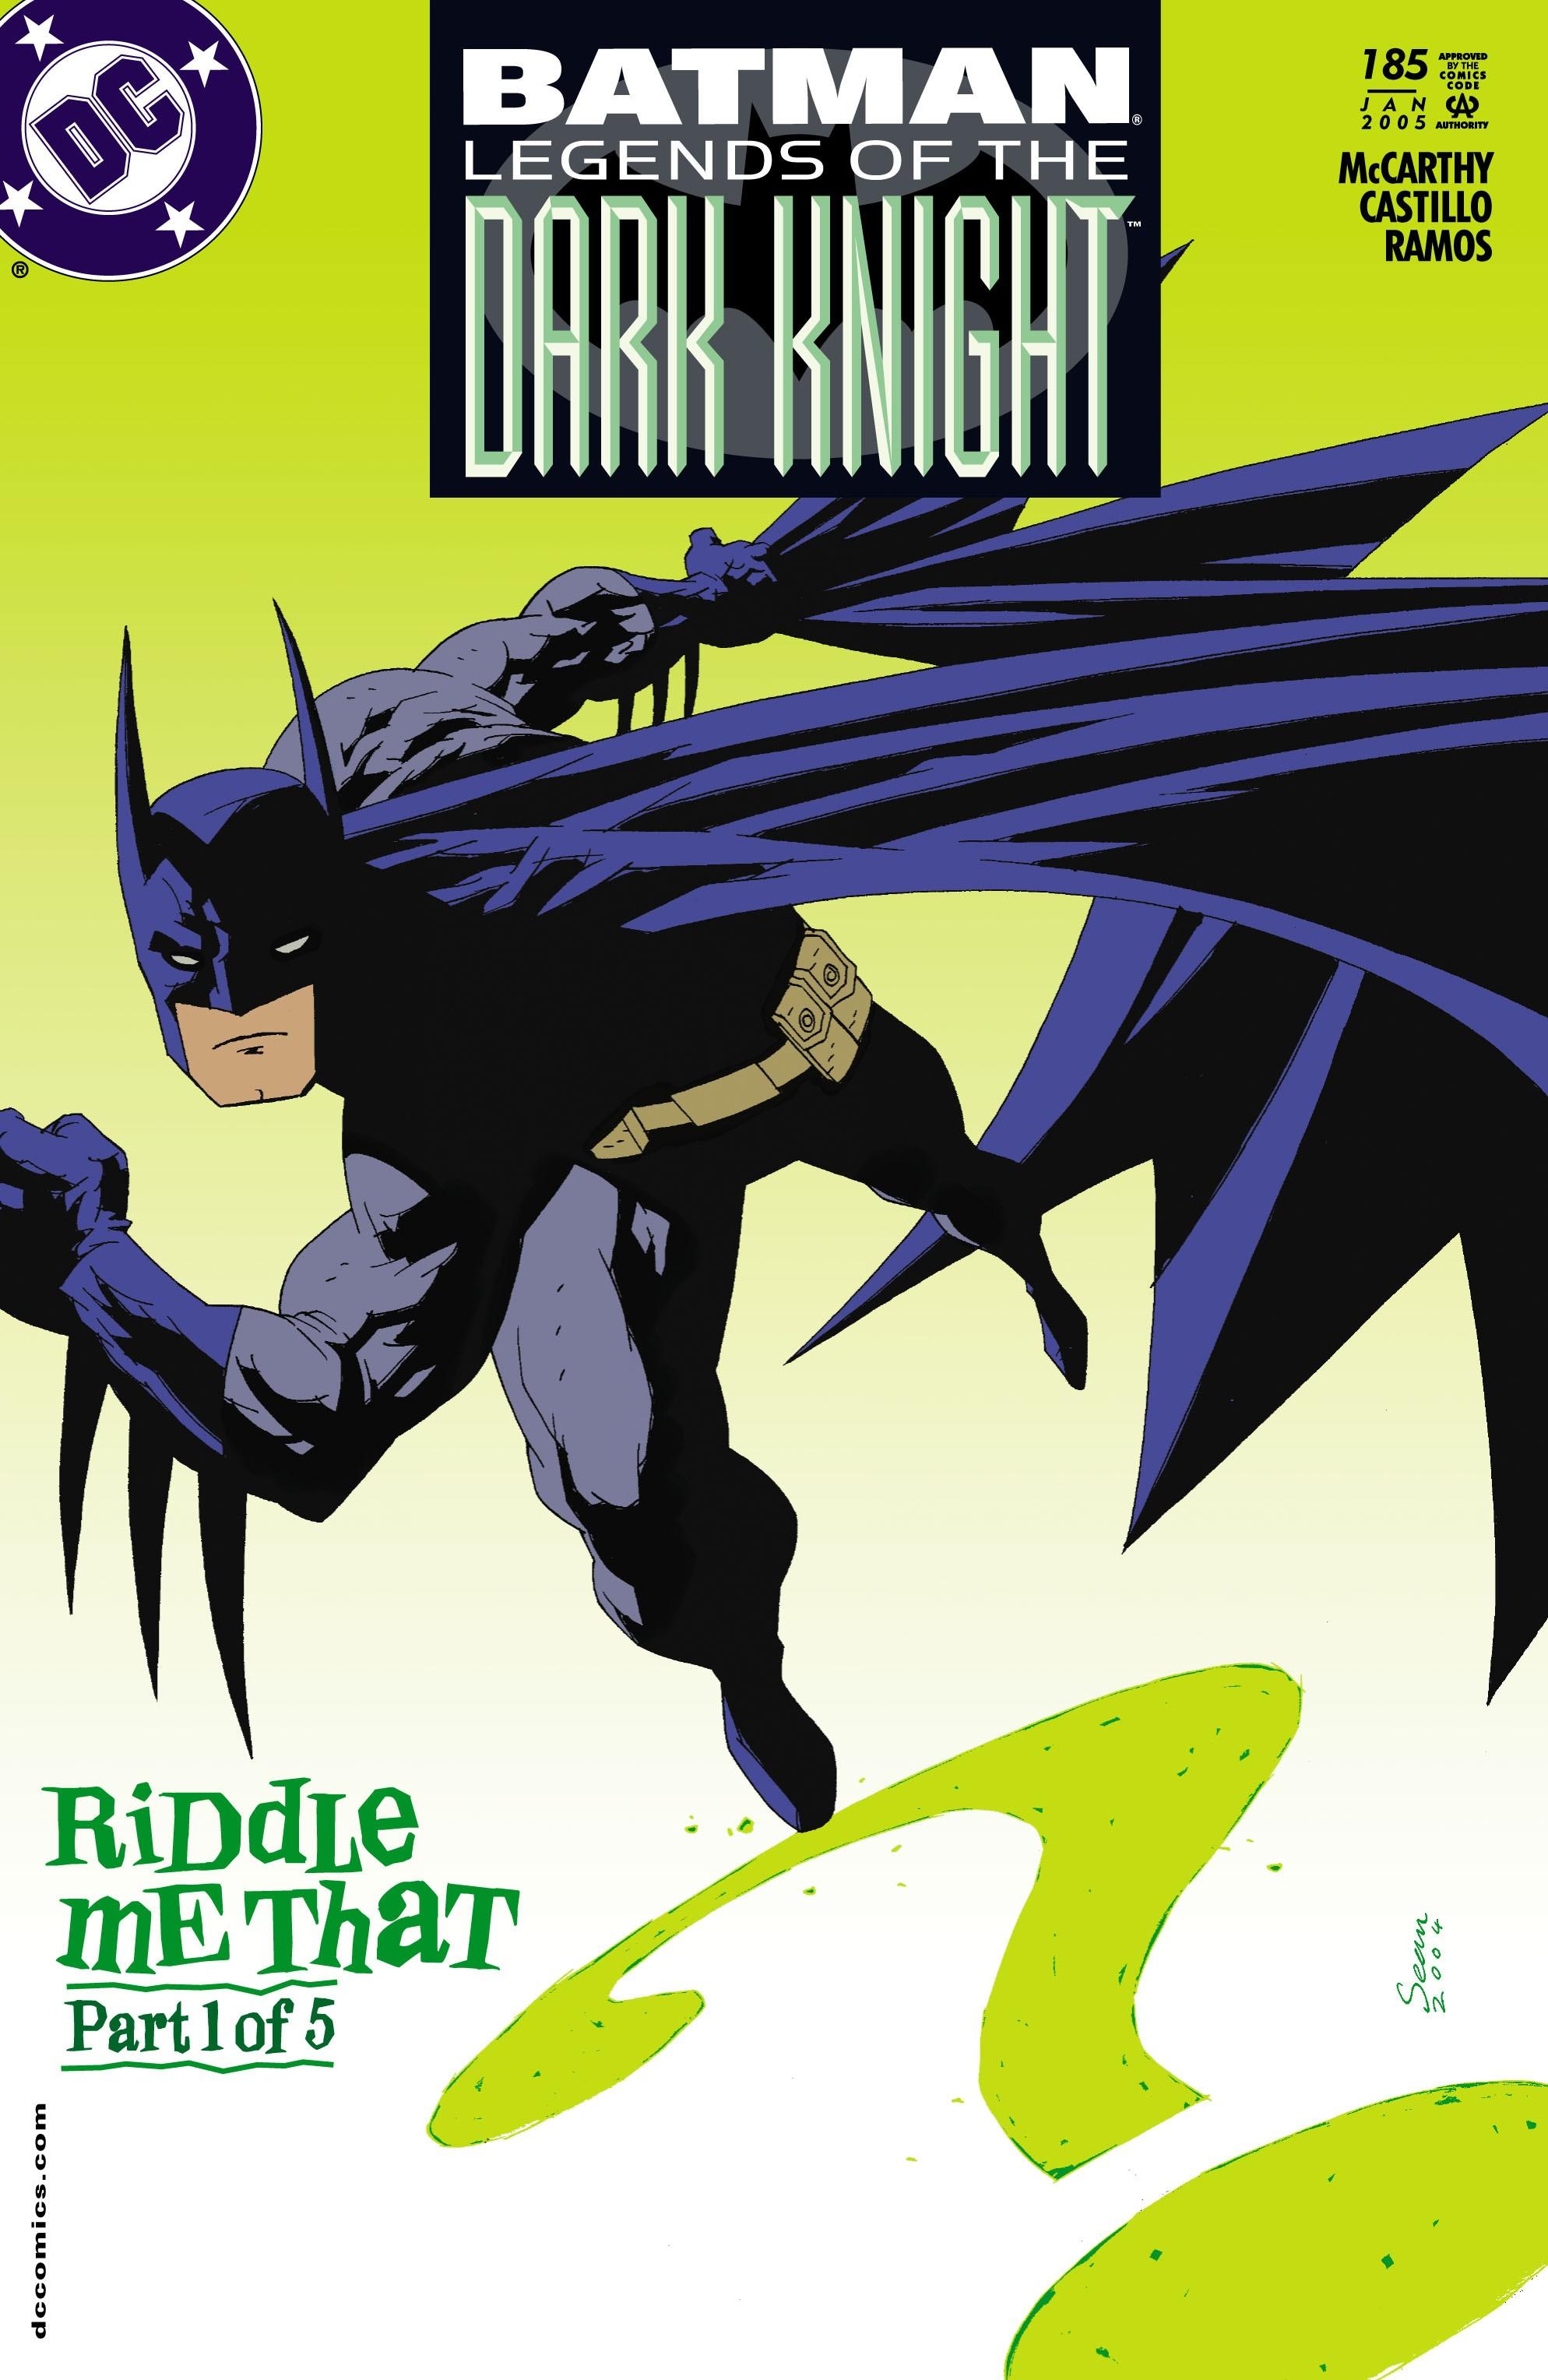 Batman: Legends of the Dark Knight 185 Page 1